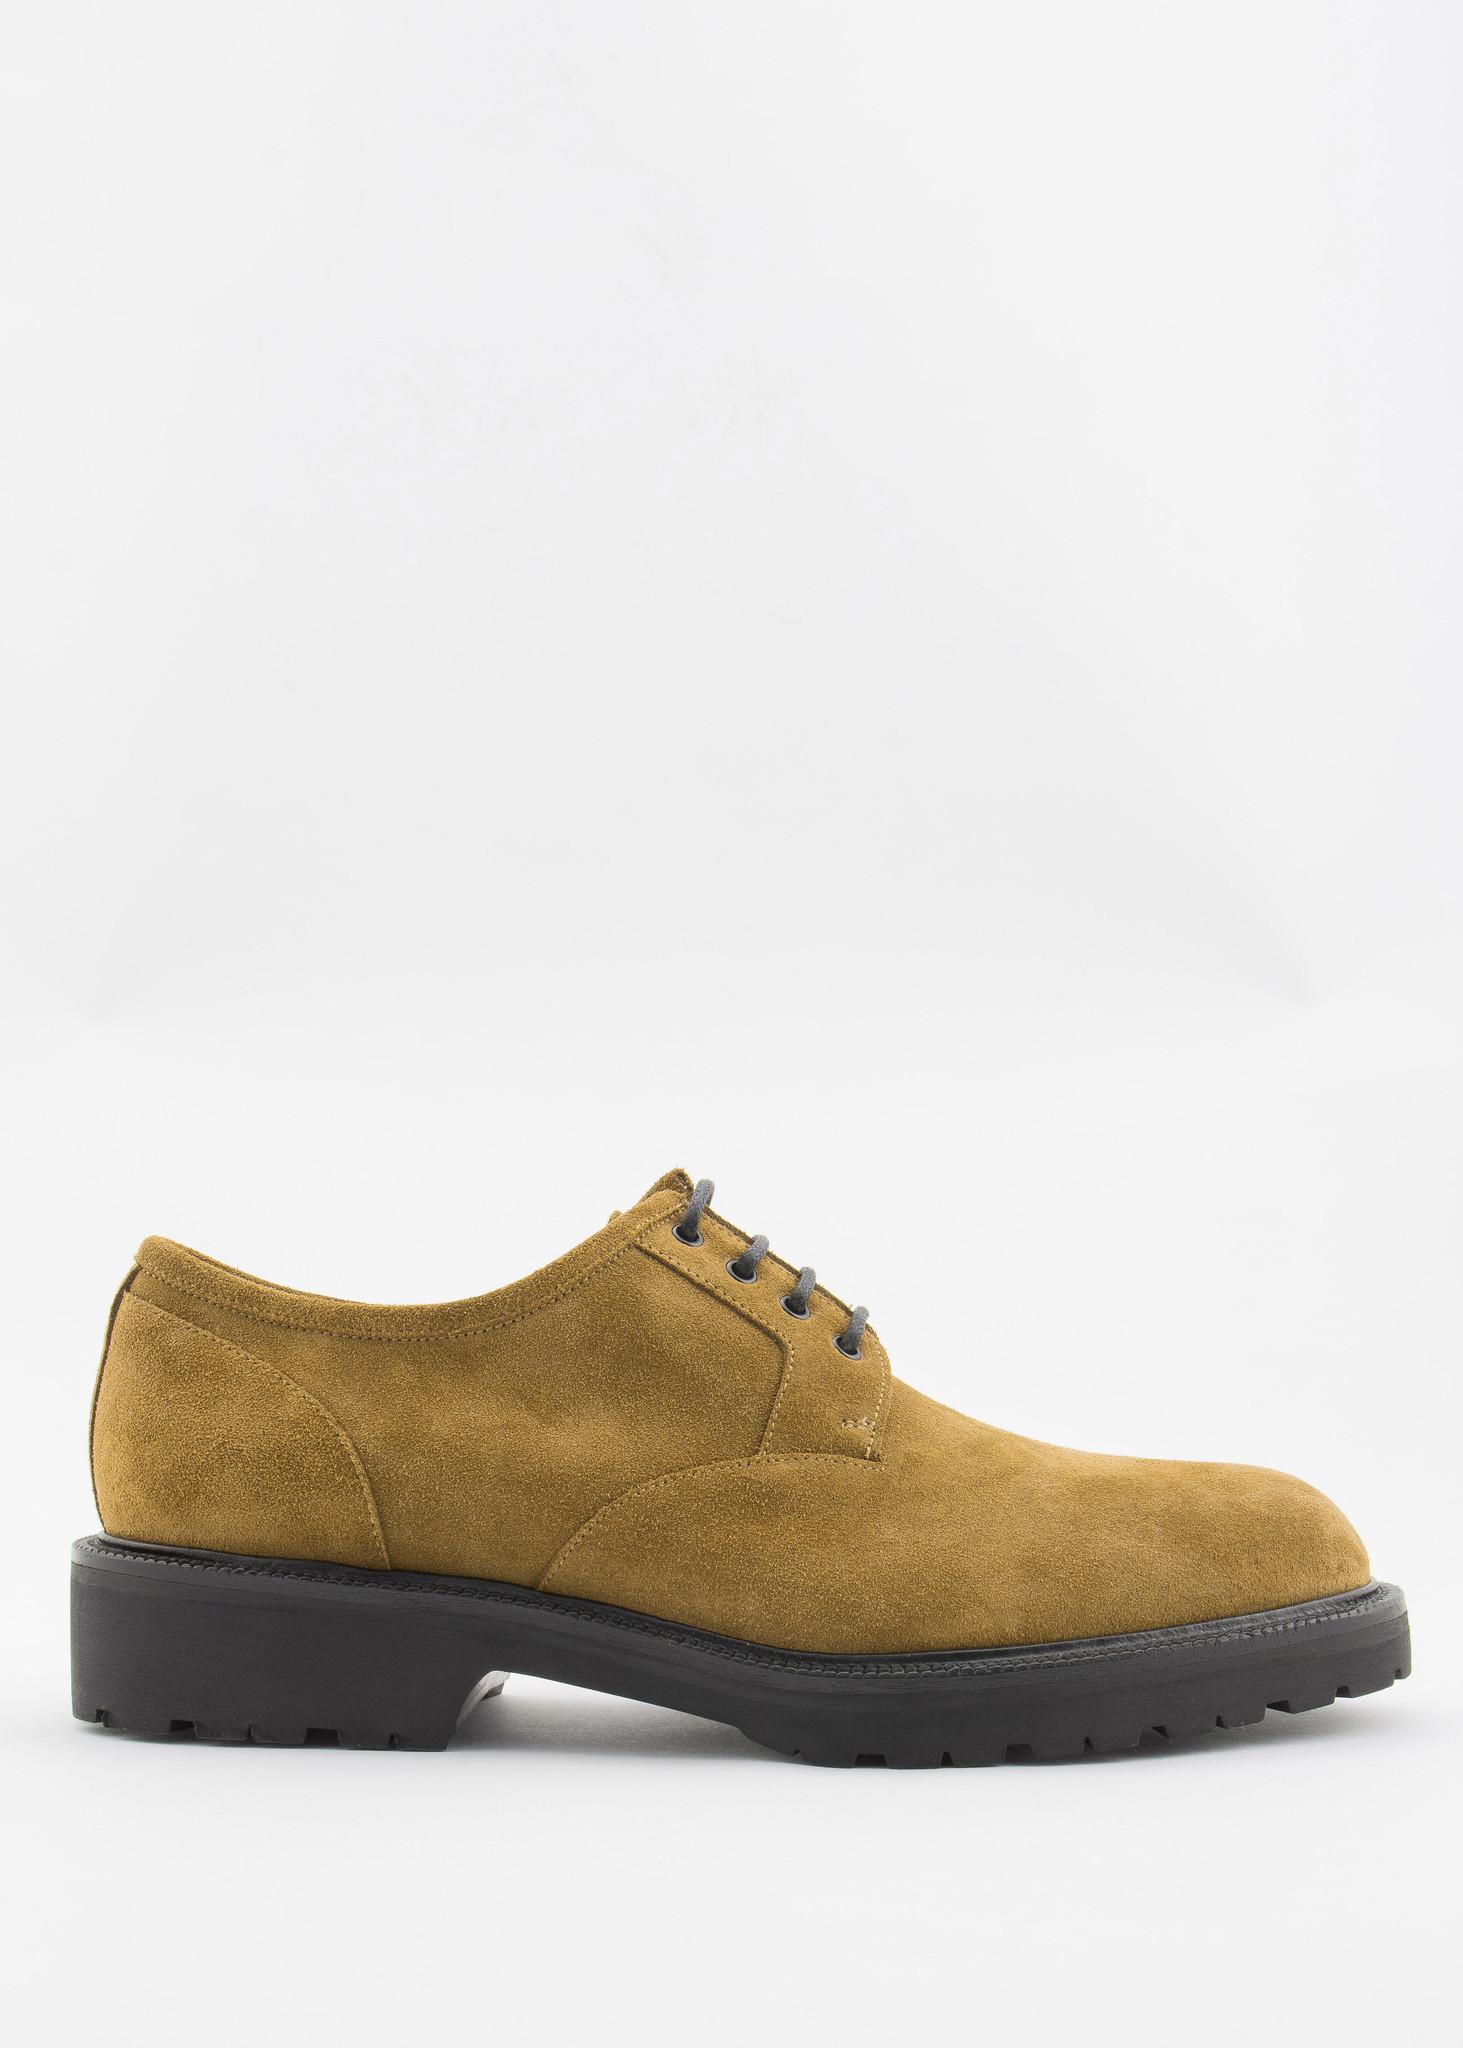 Camel Dressed Shoes